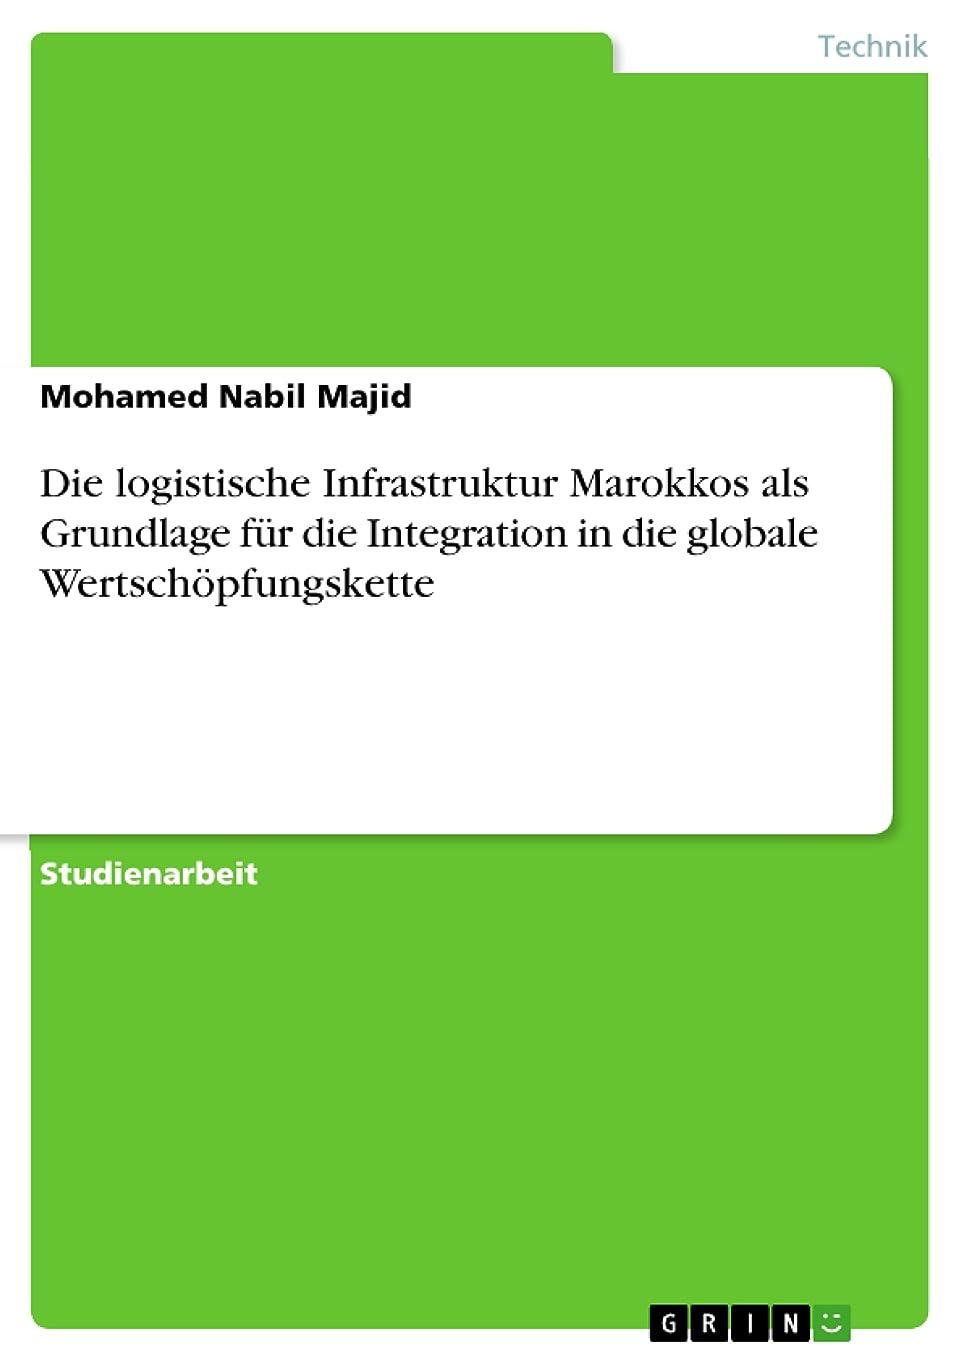 修理工残酷な首Die logistische Infrastruktur Marokkos als Grundlage für die Integration in die globale Wertsch?pfungskette (German Edition)